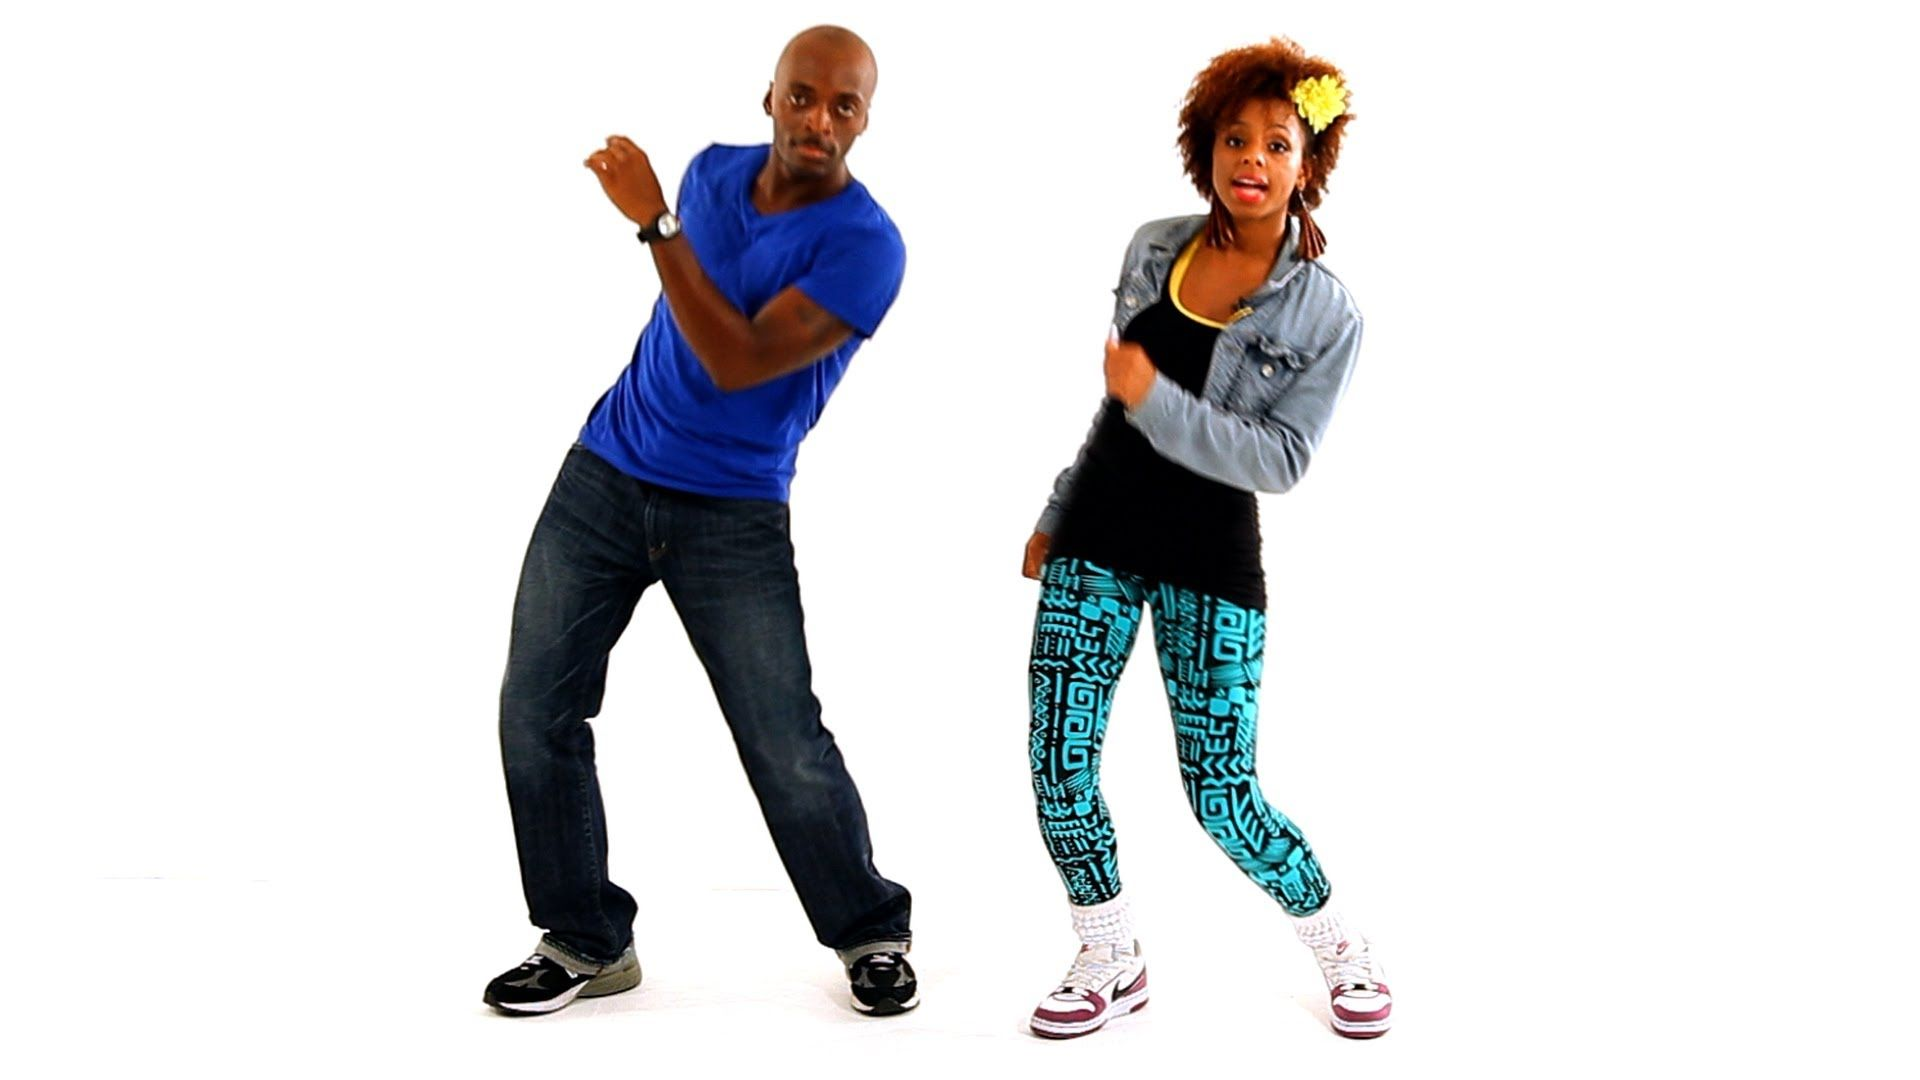 How to dance hip-hop